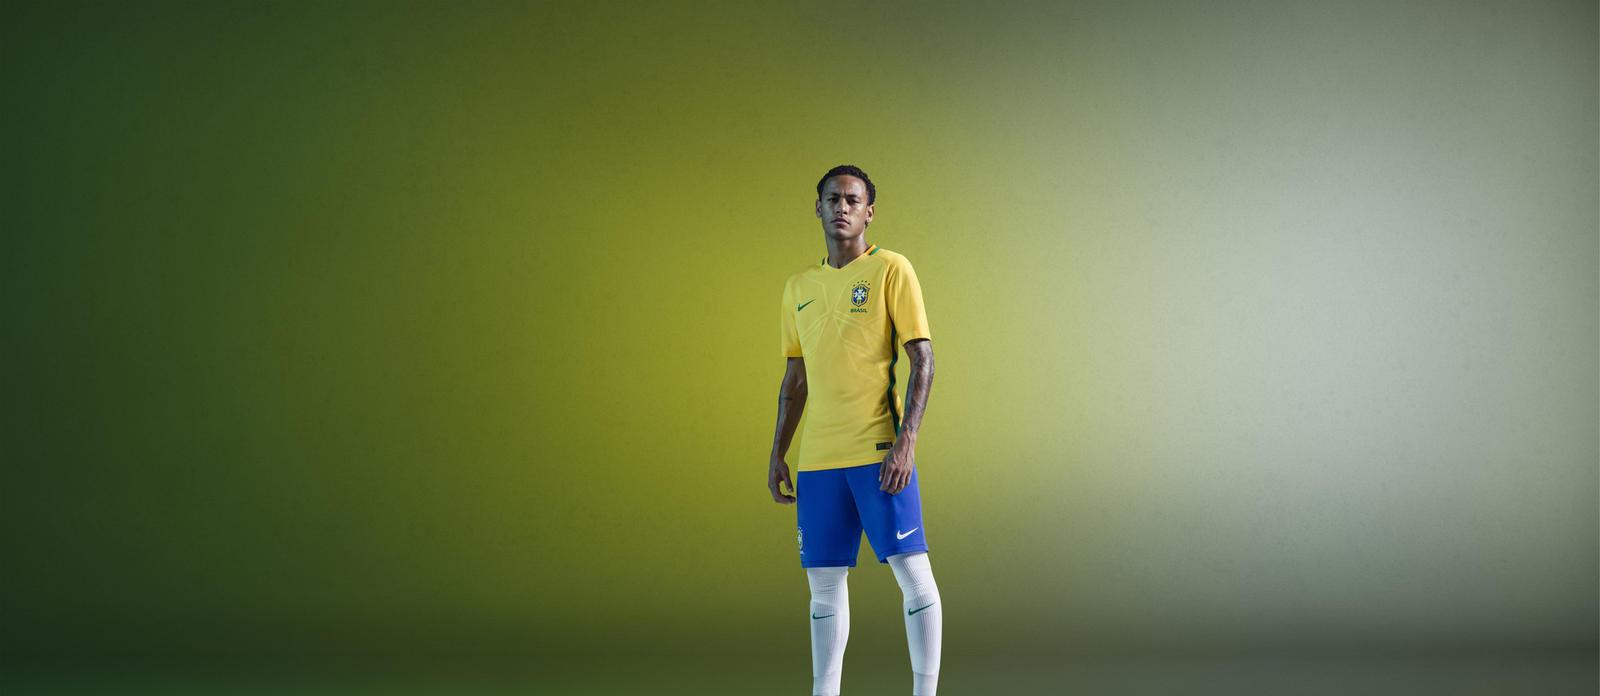 Brasil 2016 National Football Kits Nike News